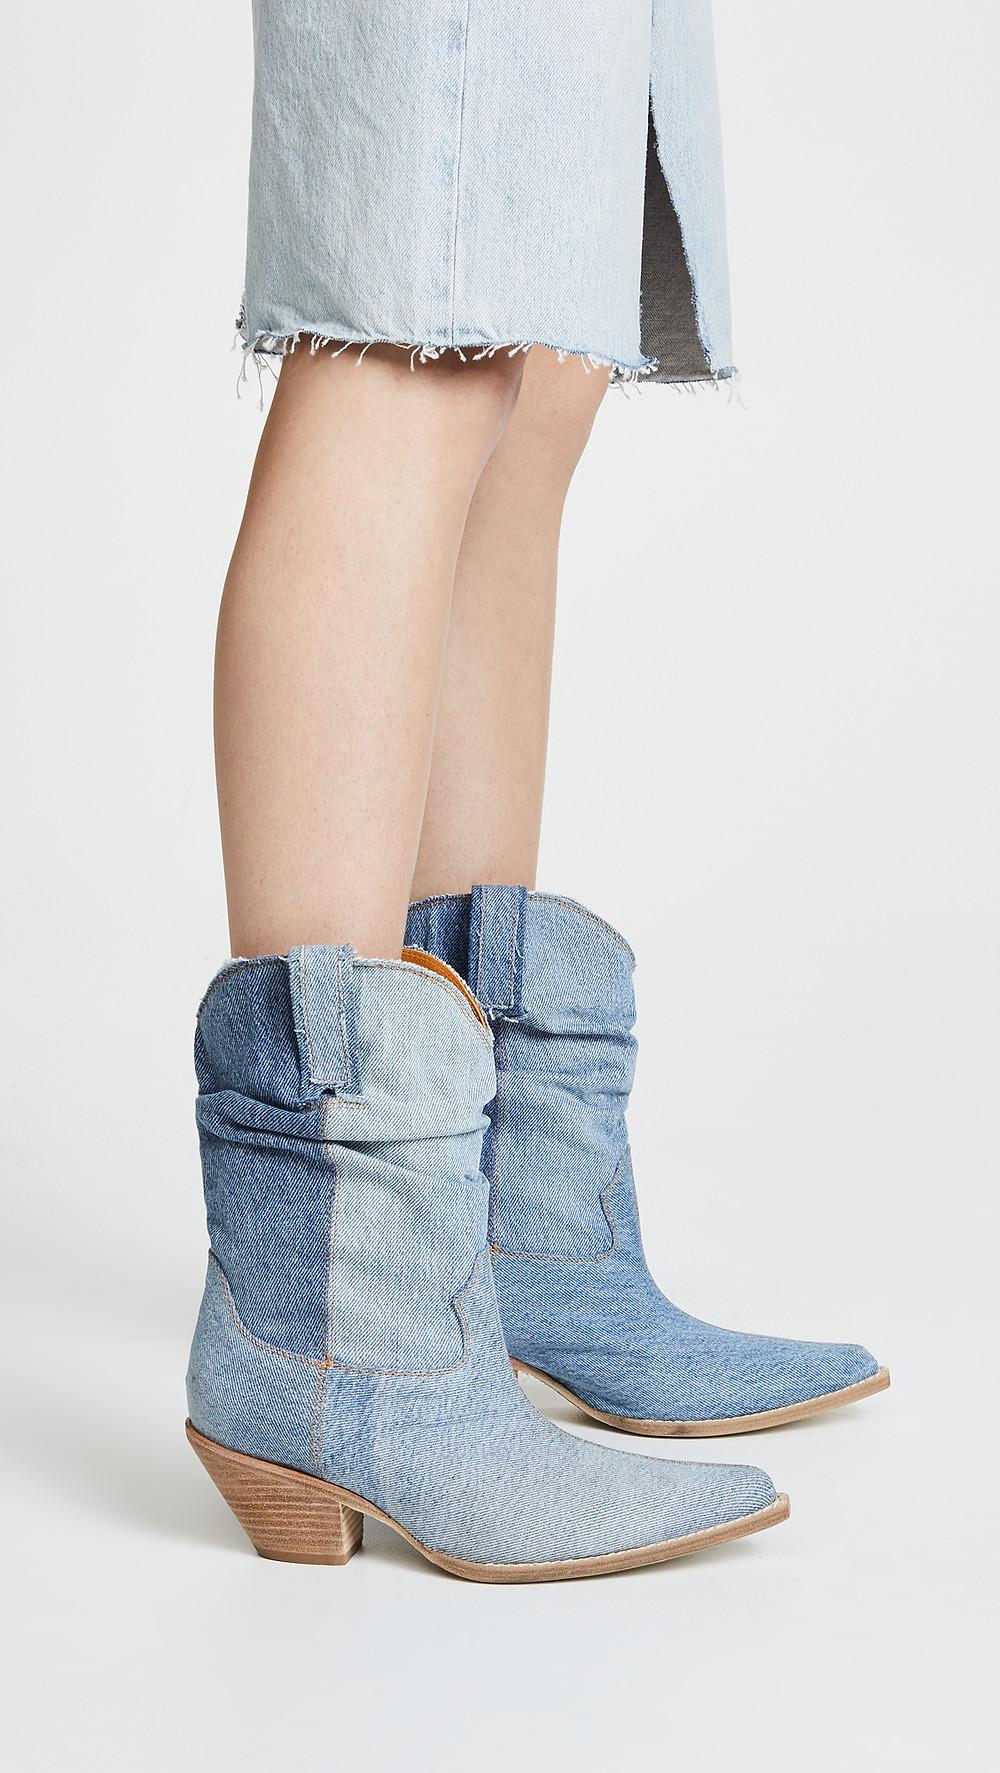 R13 Low Crunch Cowboy Boots $915